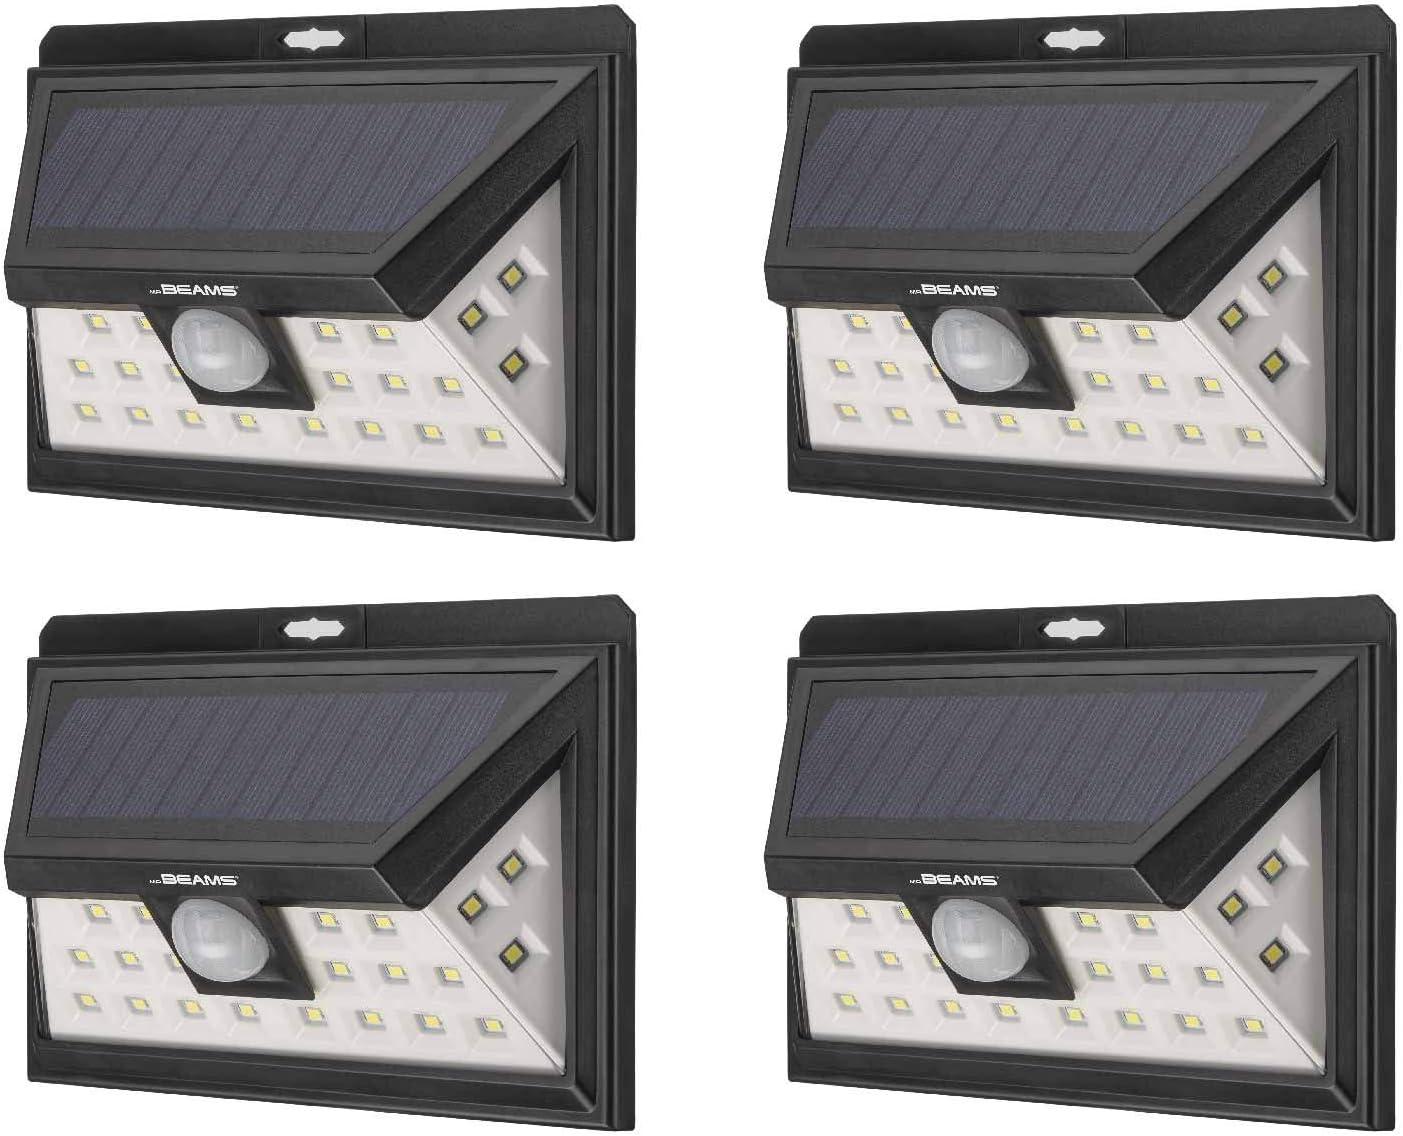 Mr Beams Solar Wedge Plus 24 LED Security Outdoor Motion Sensor Wall Light, 4 pack, Black